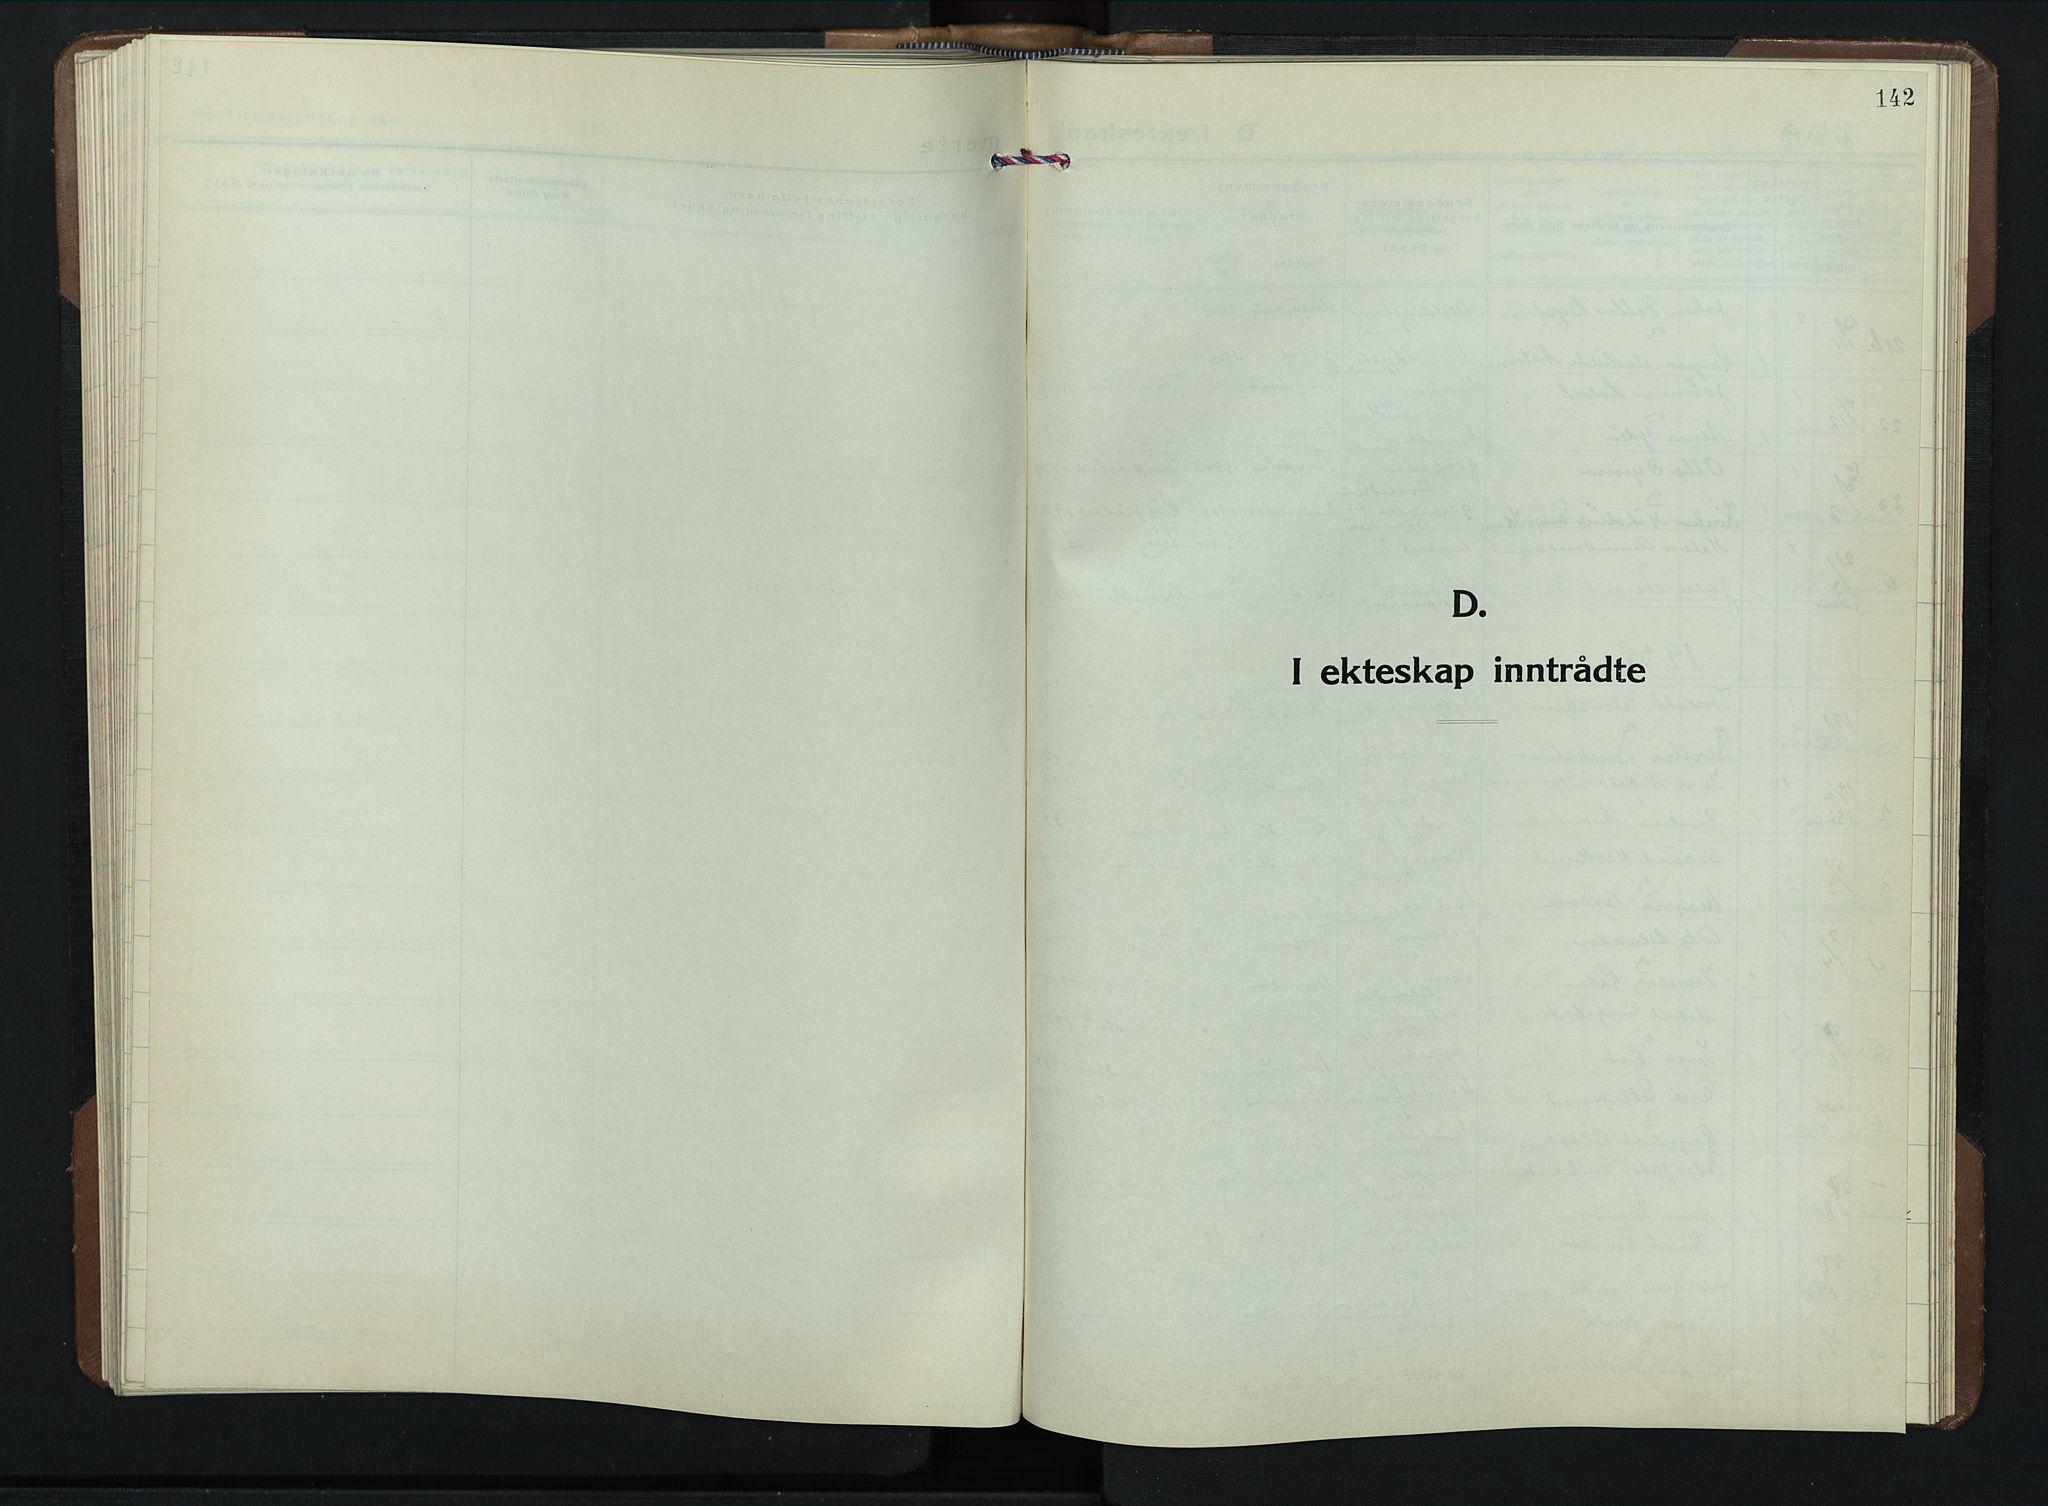 SAH, Brandbu prestekontor, Klokkerbok nr. 2, 1937-1953, s. 142